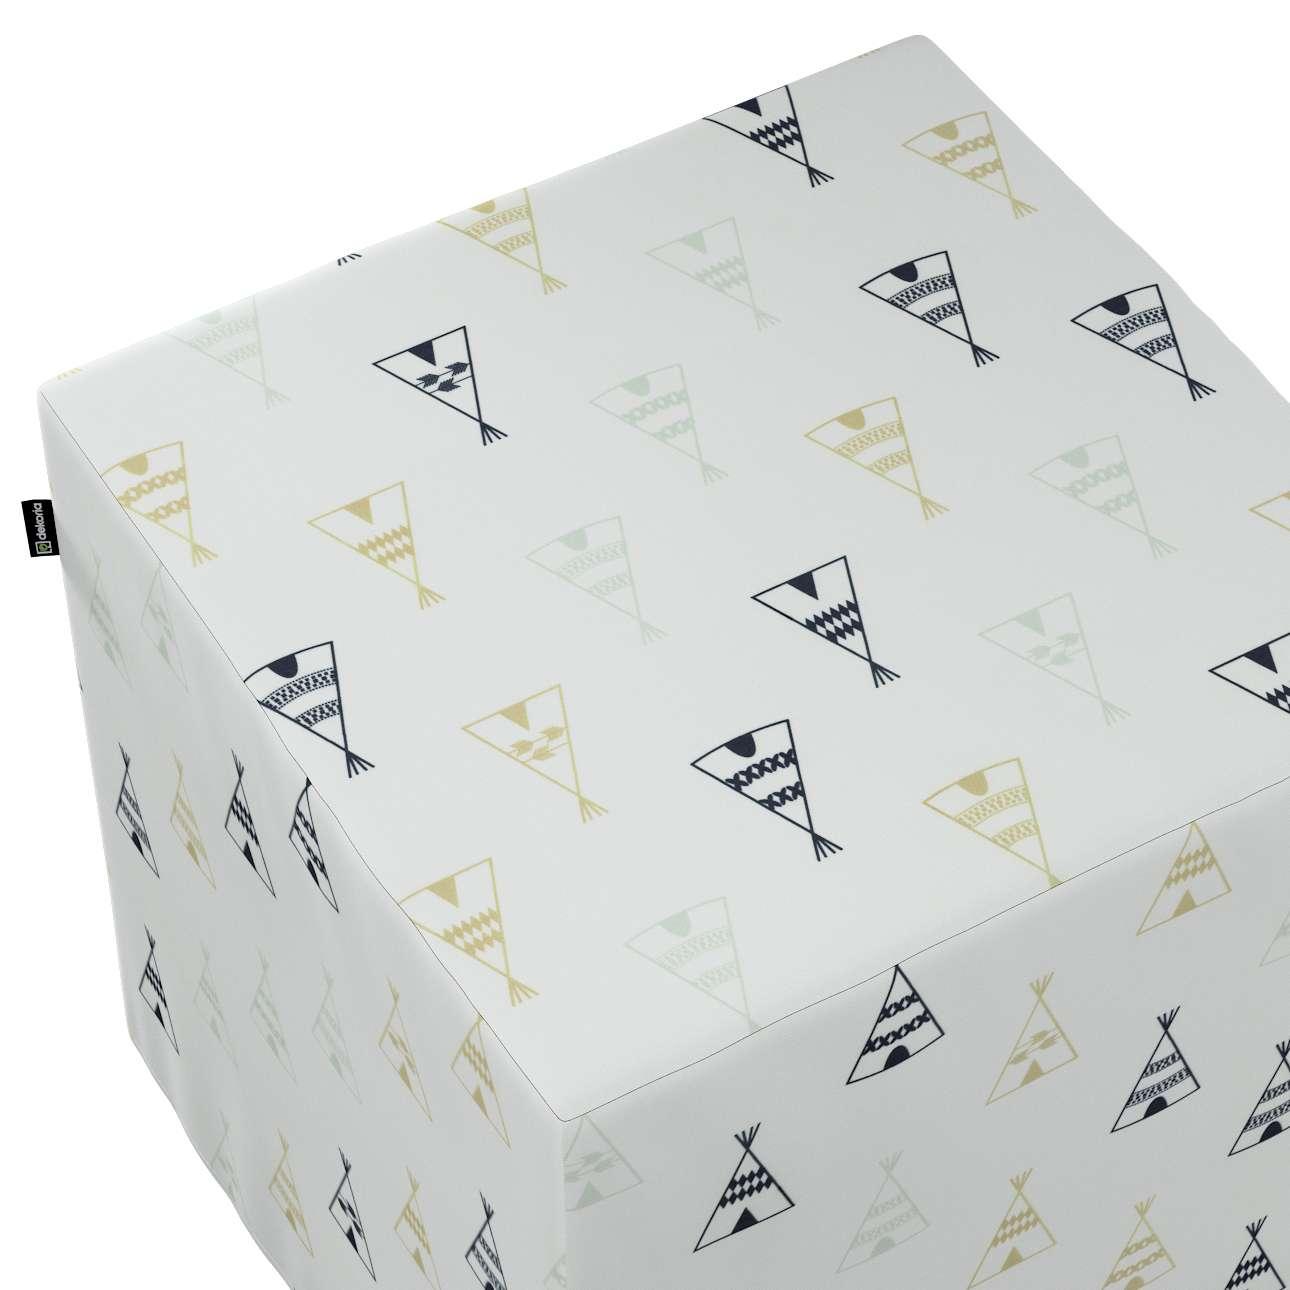 Poťah na taburetku,kocka V kolekcii Adventure, tkanina: 141-84